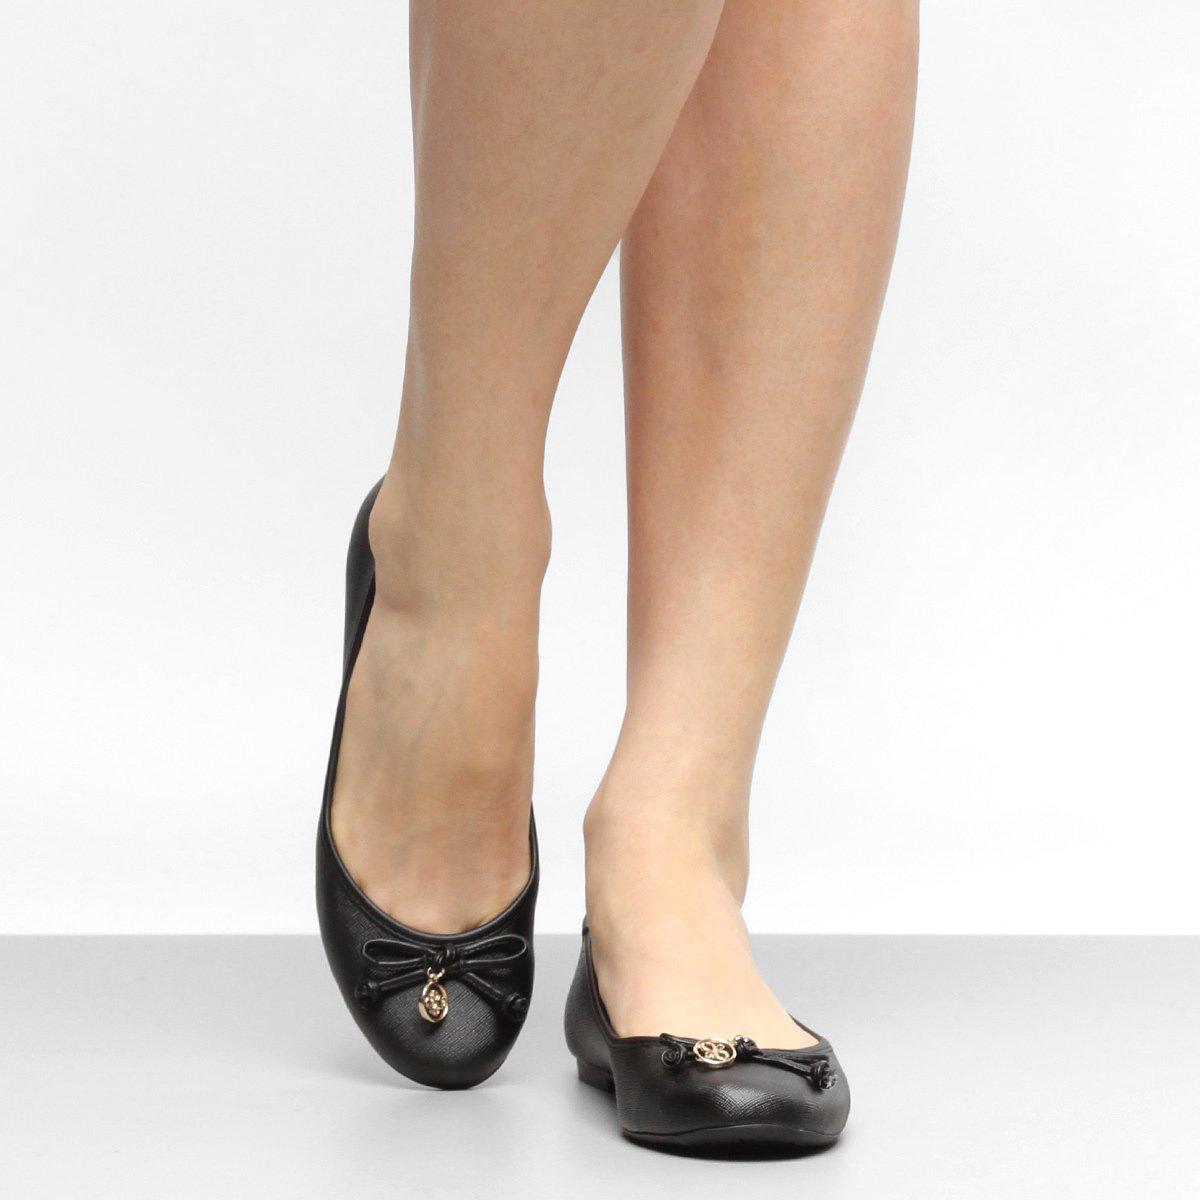 3fbbdf53d Sapatilha Shoestock Bico Redondo Medalha Feminina